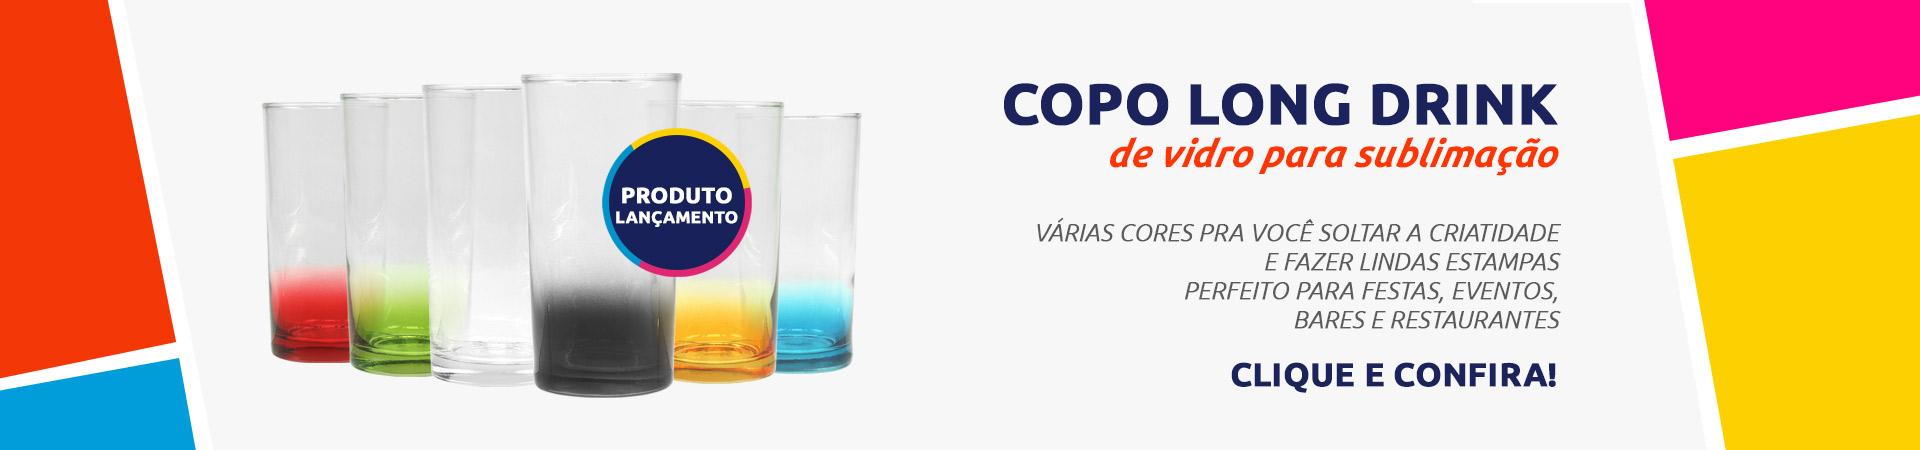 Copo long drink de vidro